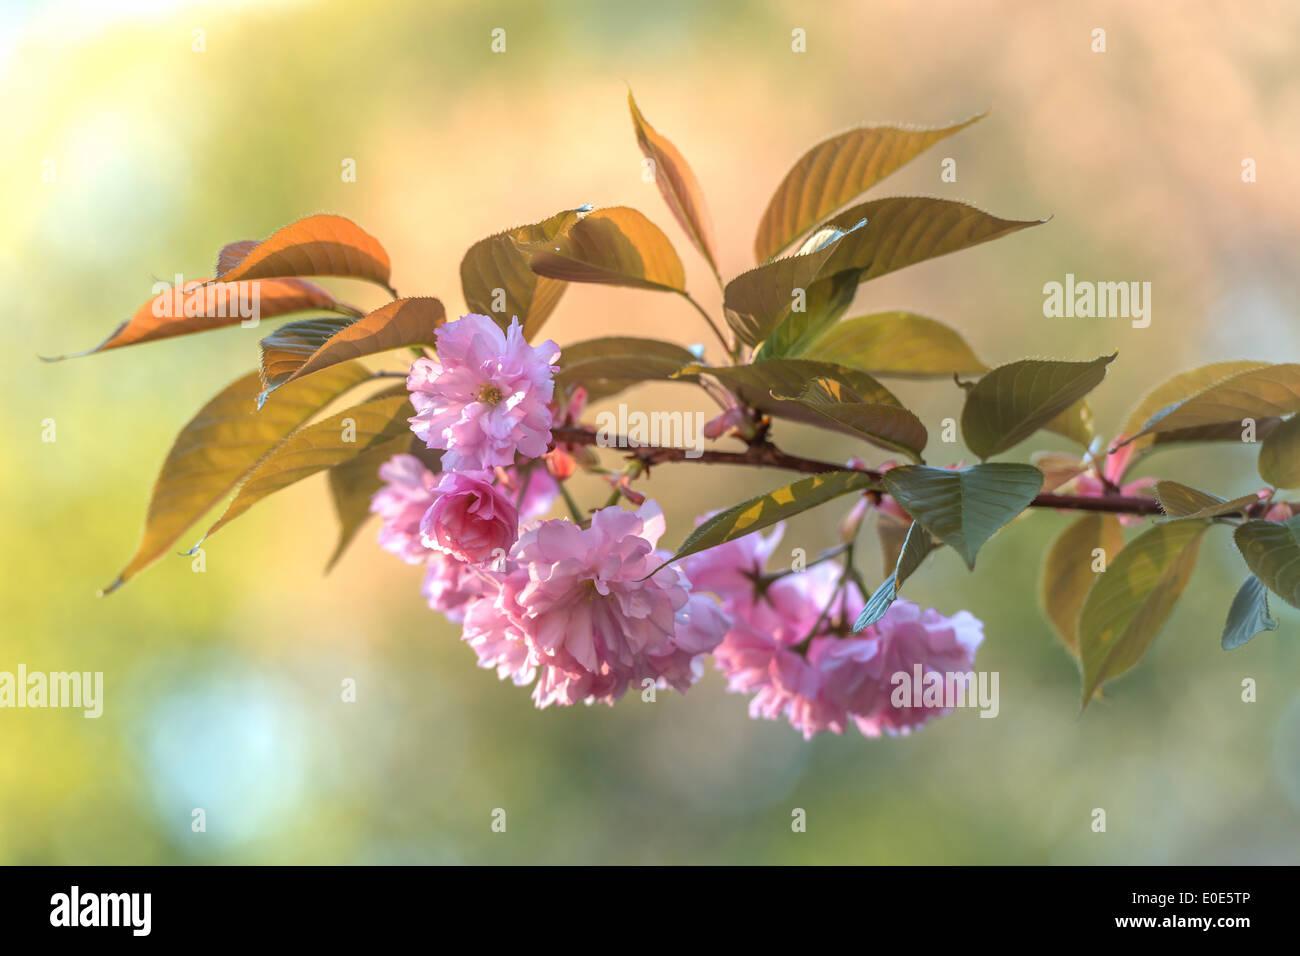 beauty sakura twig close up - Stock Image